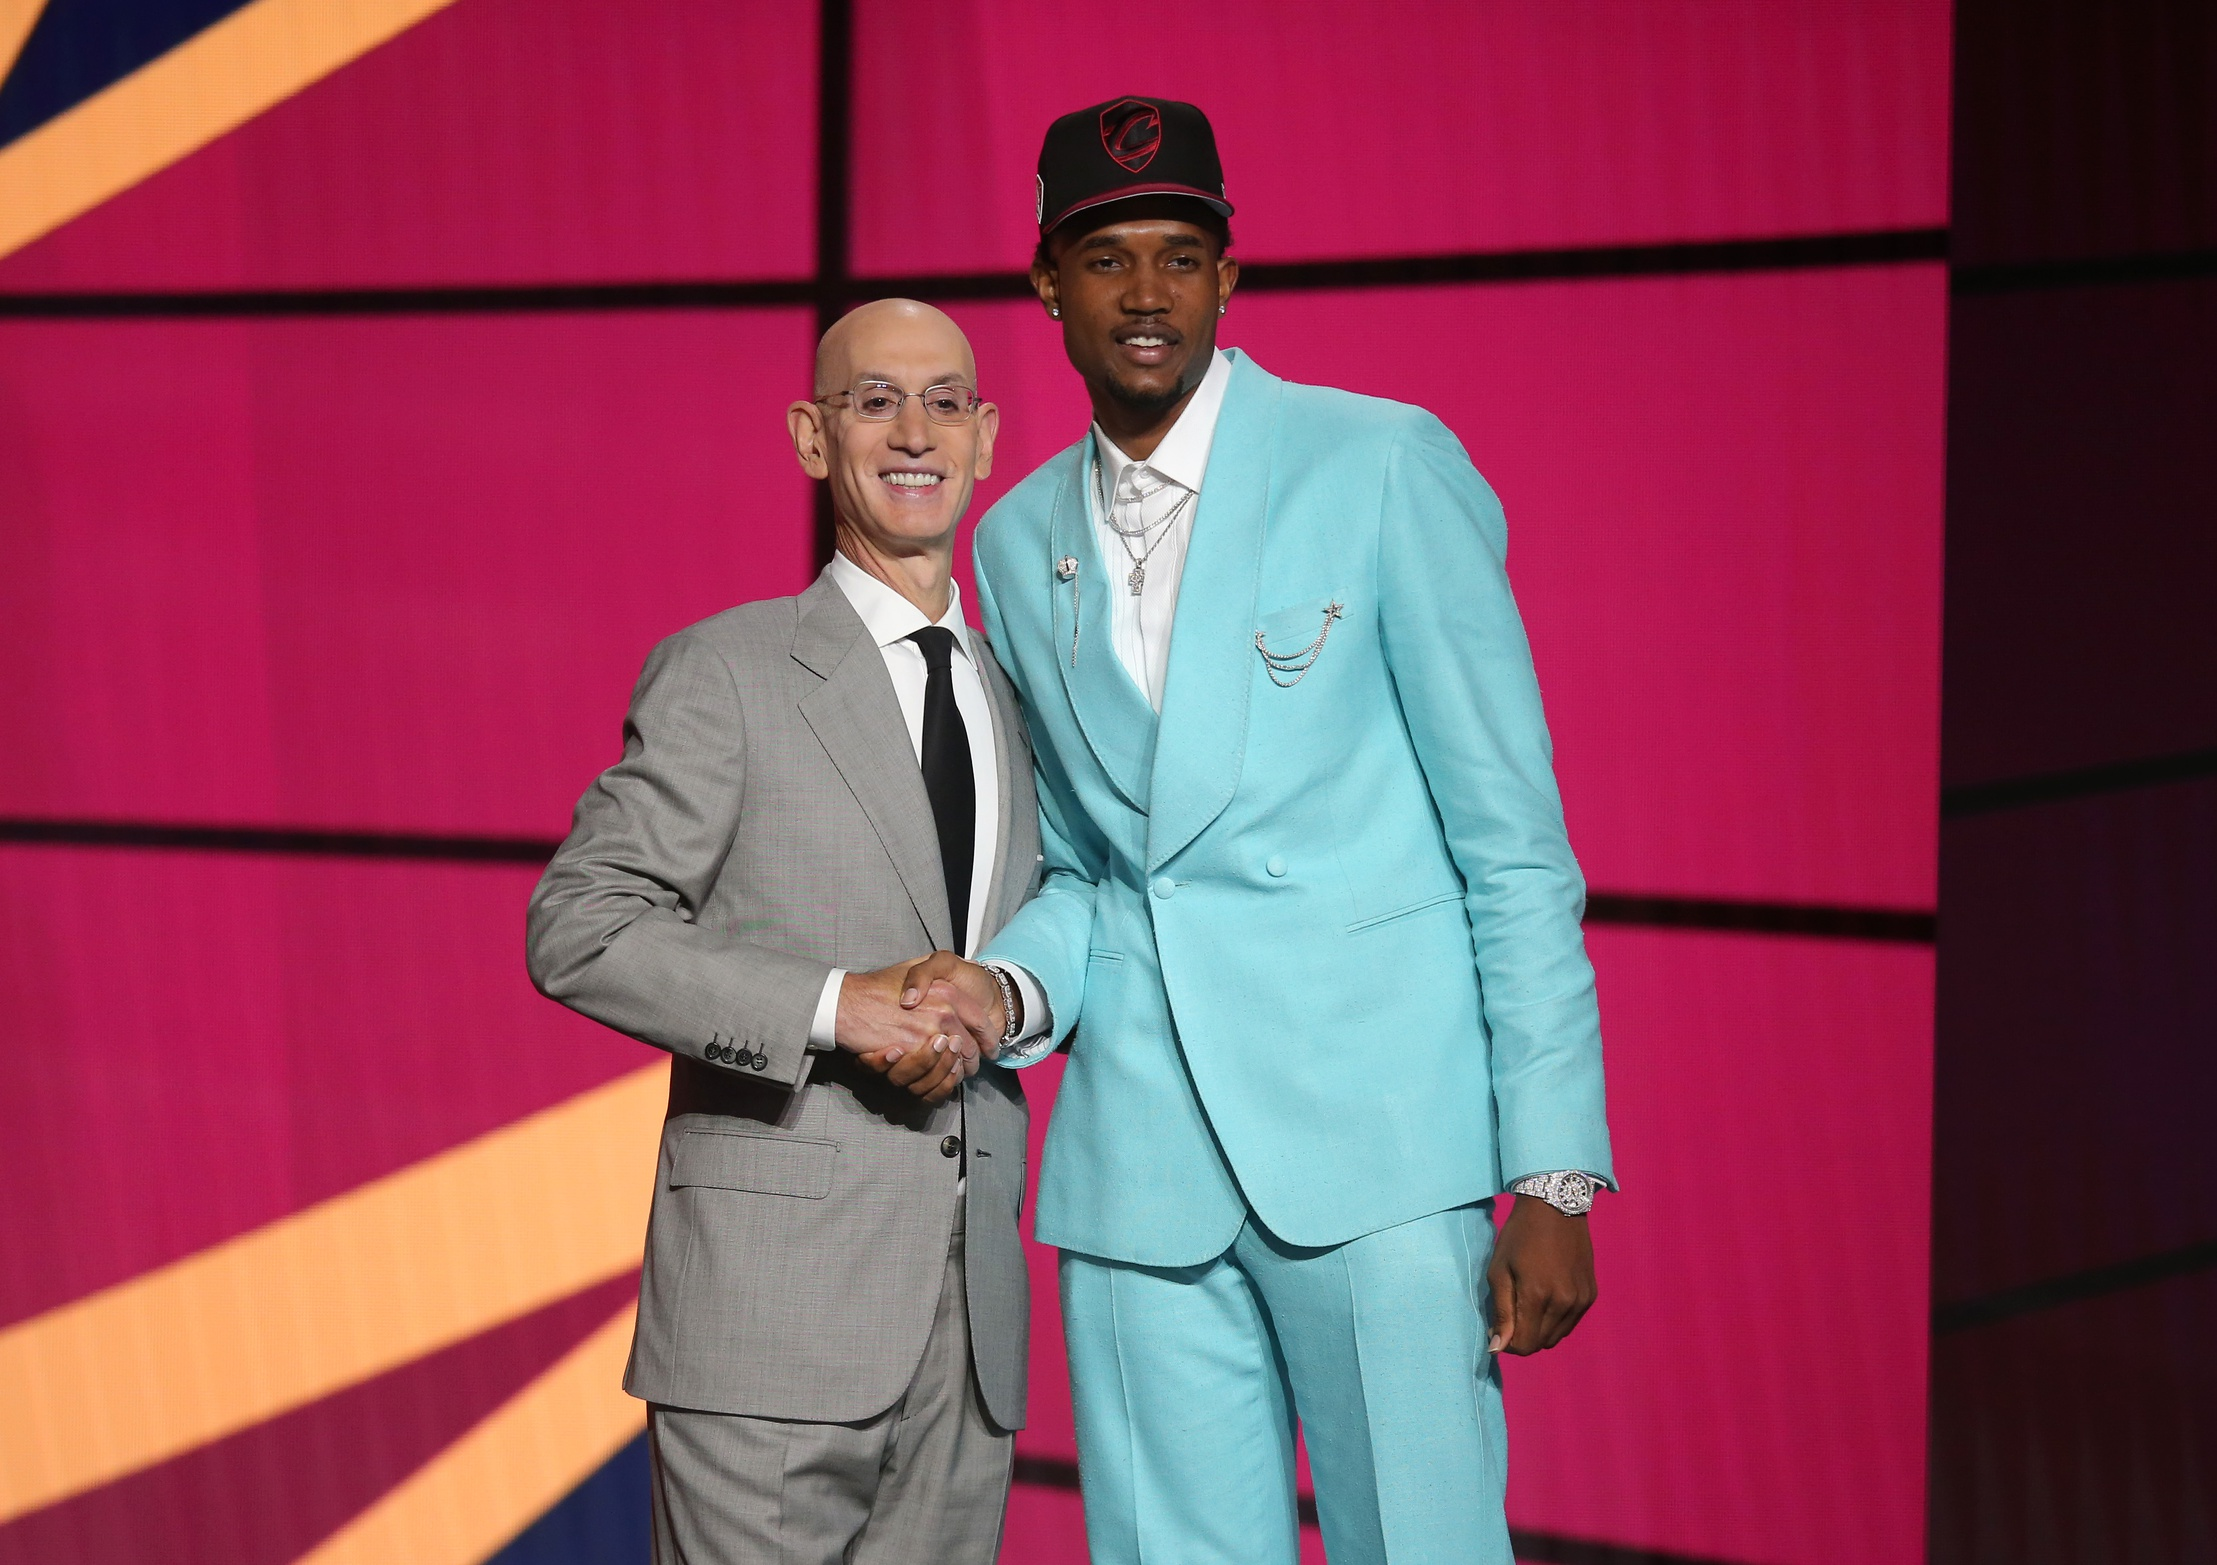 Photos: The very impressive 2021 NBA draft suits